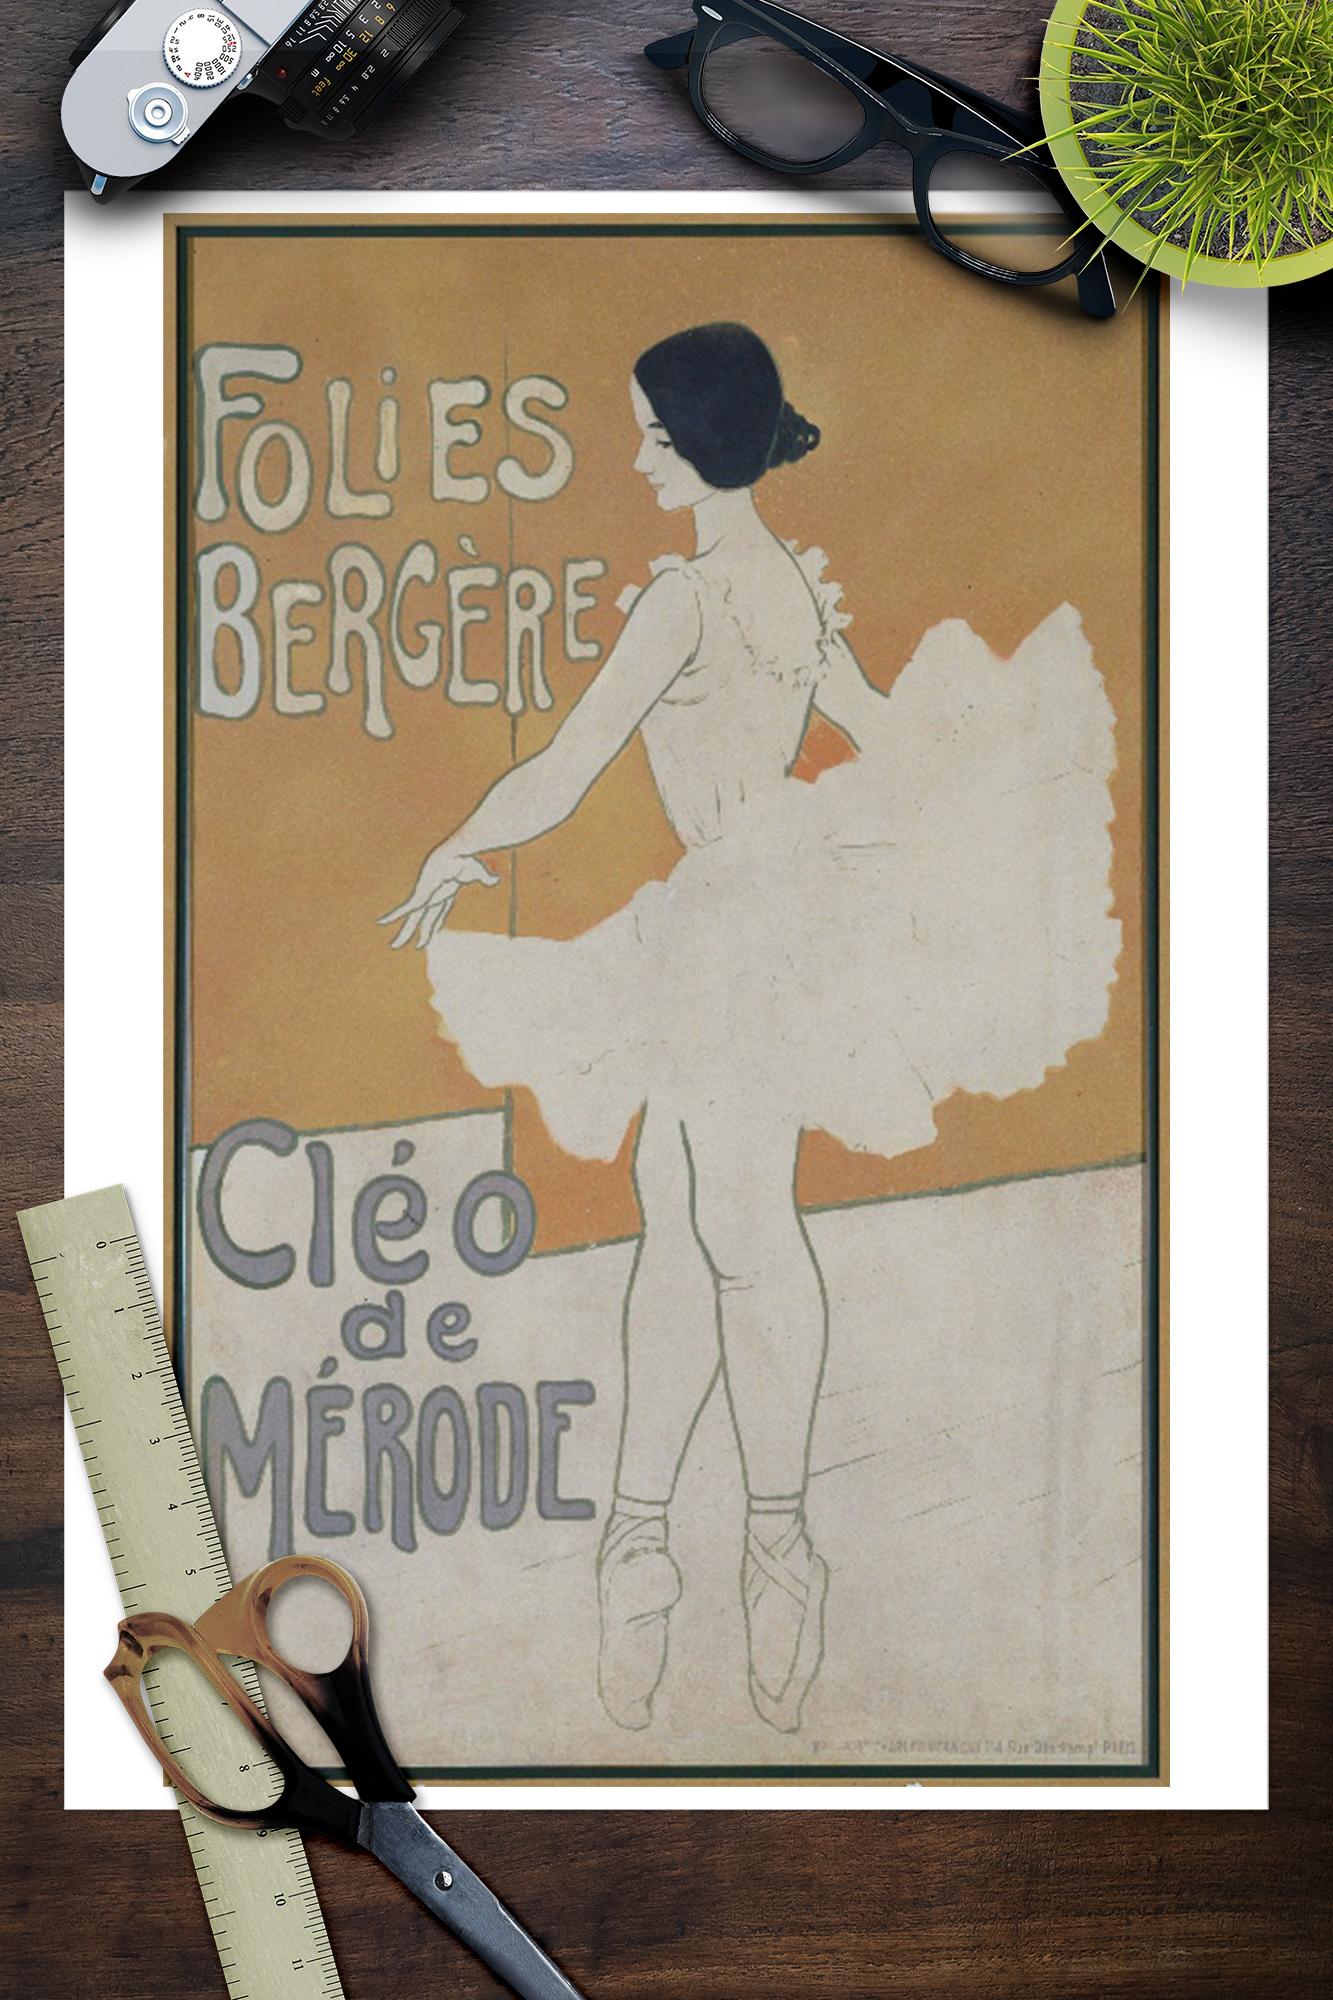 Cleo de Merode by Giovanni Boldini Art Woman Fashion Flapper 8x10 Print 0480